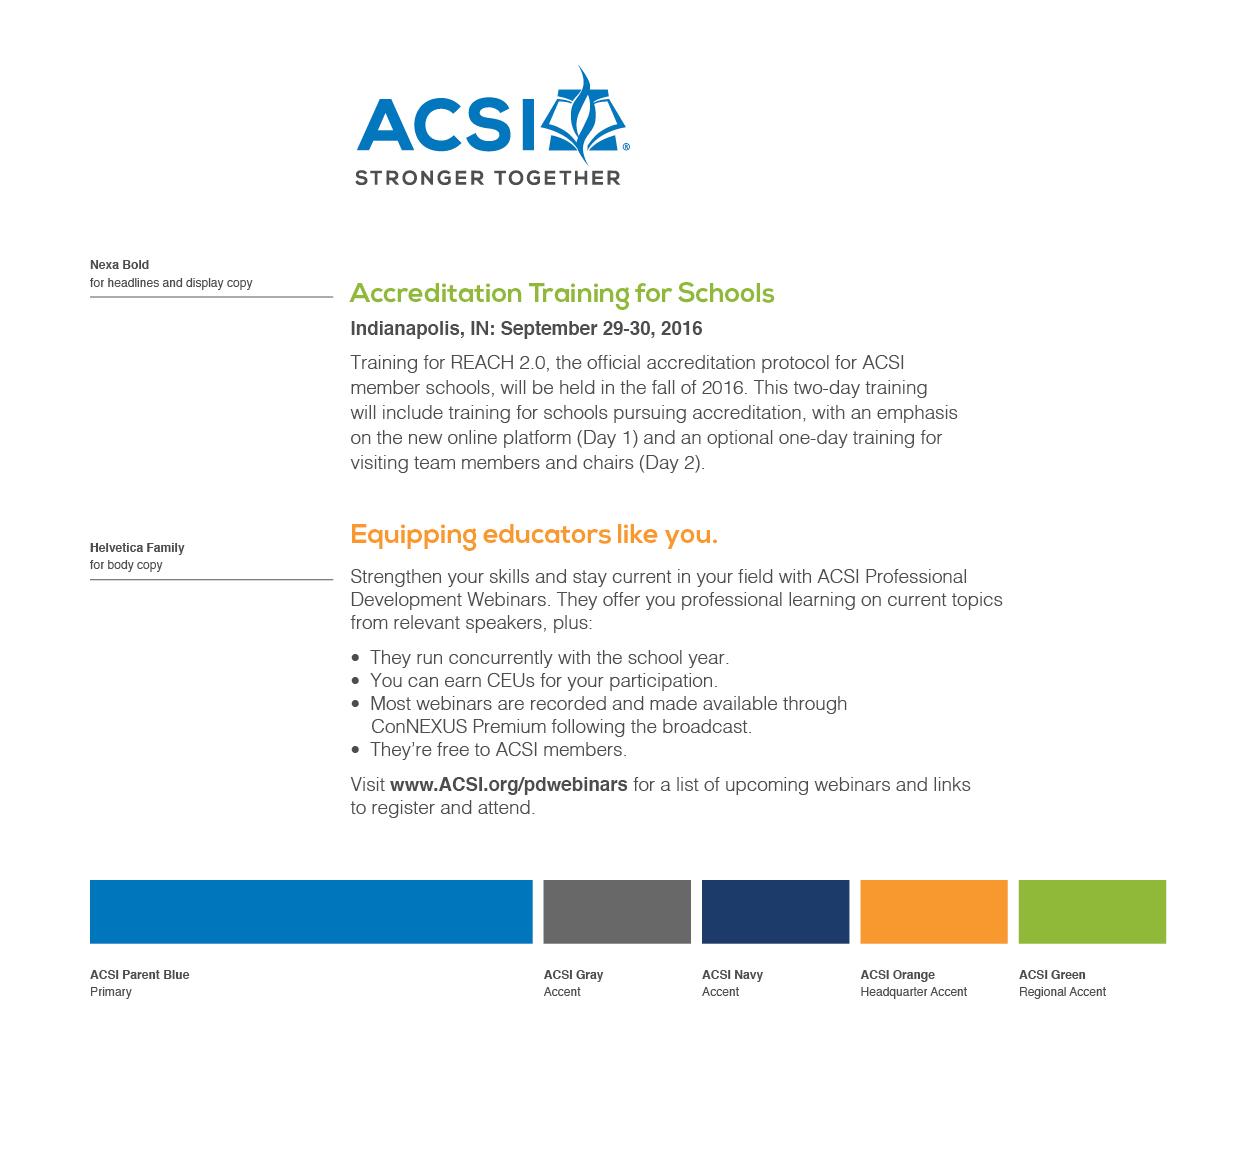 CaseStudy_ACSI7.jpg